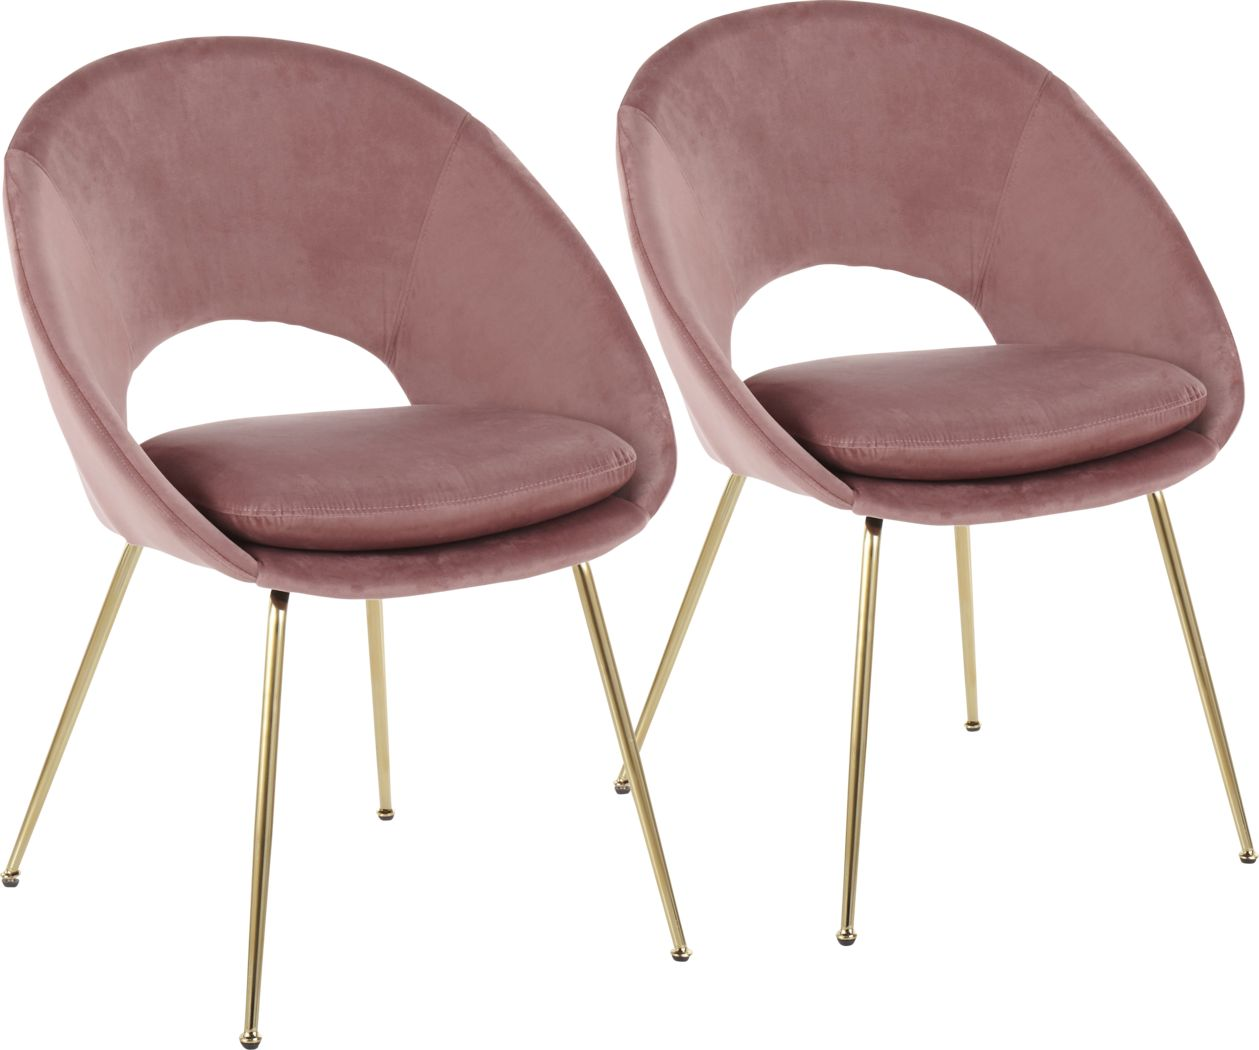 Kelann Blush Side Chair, Set of 2